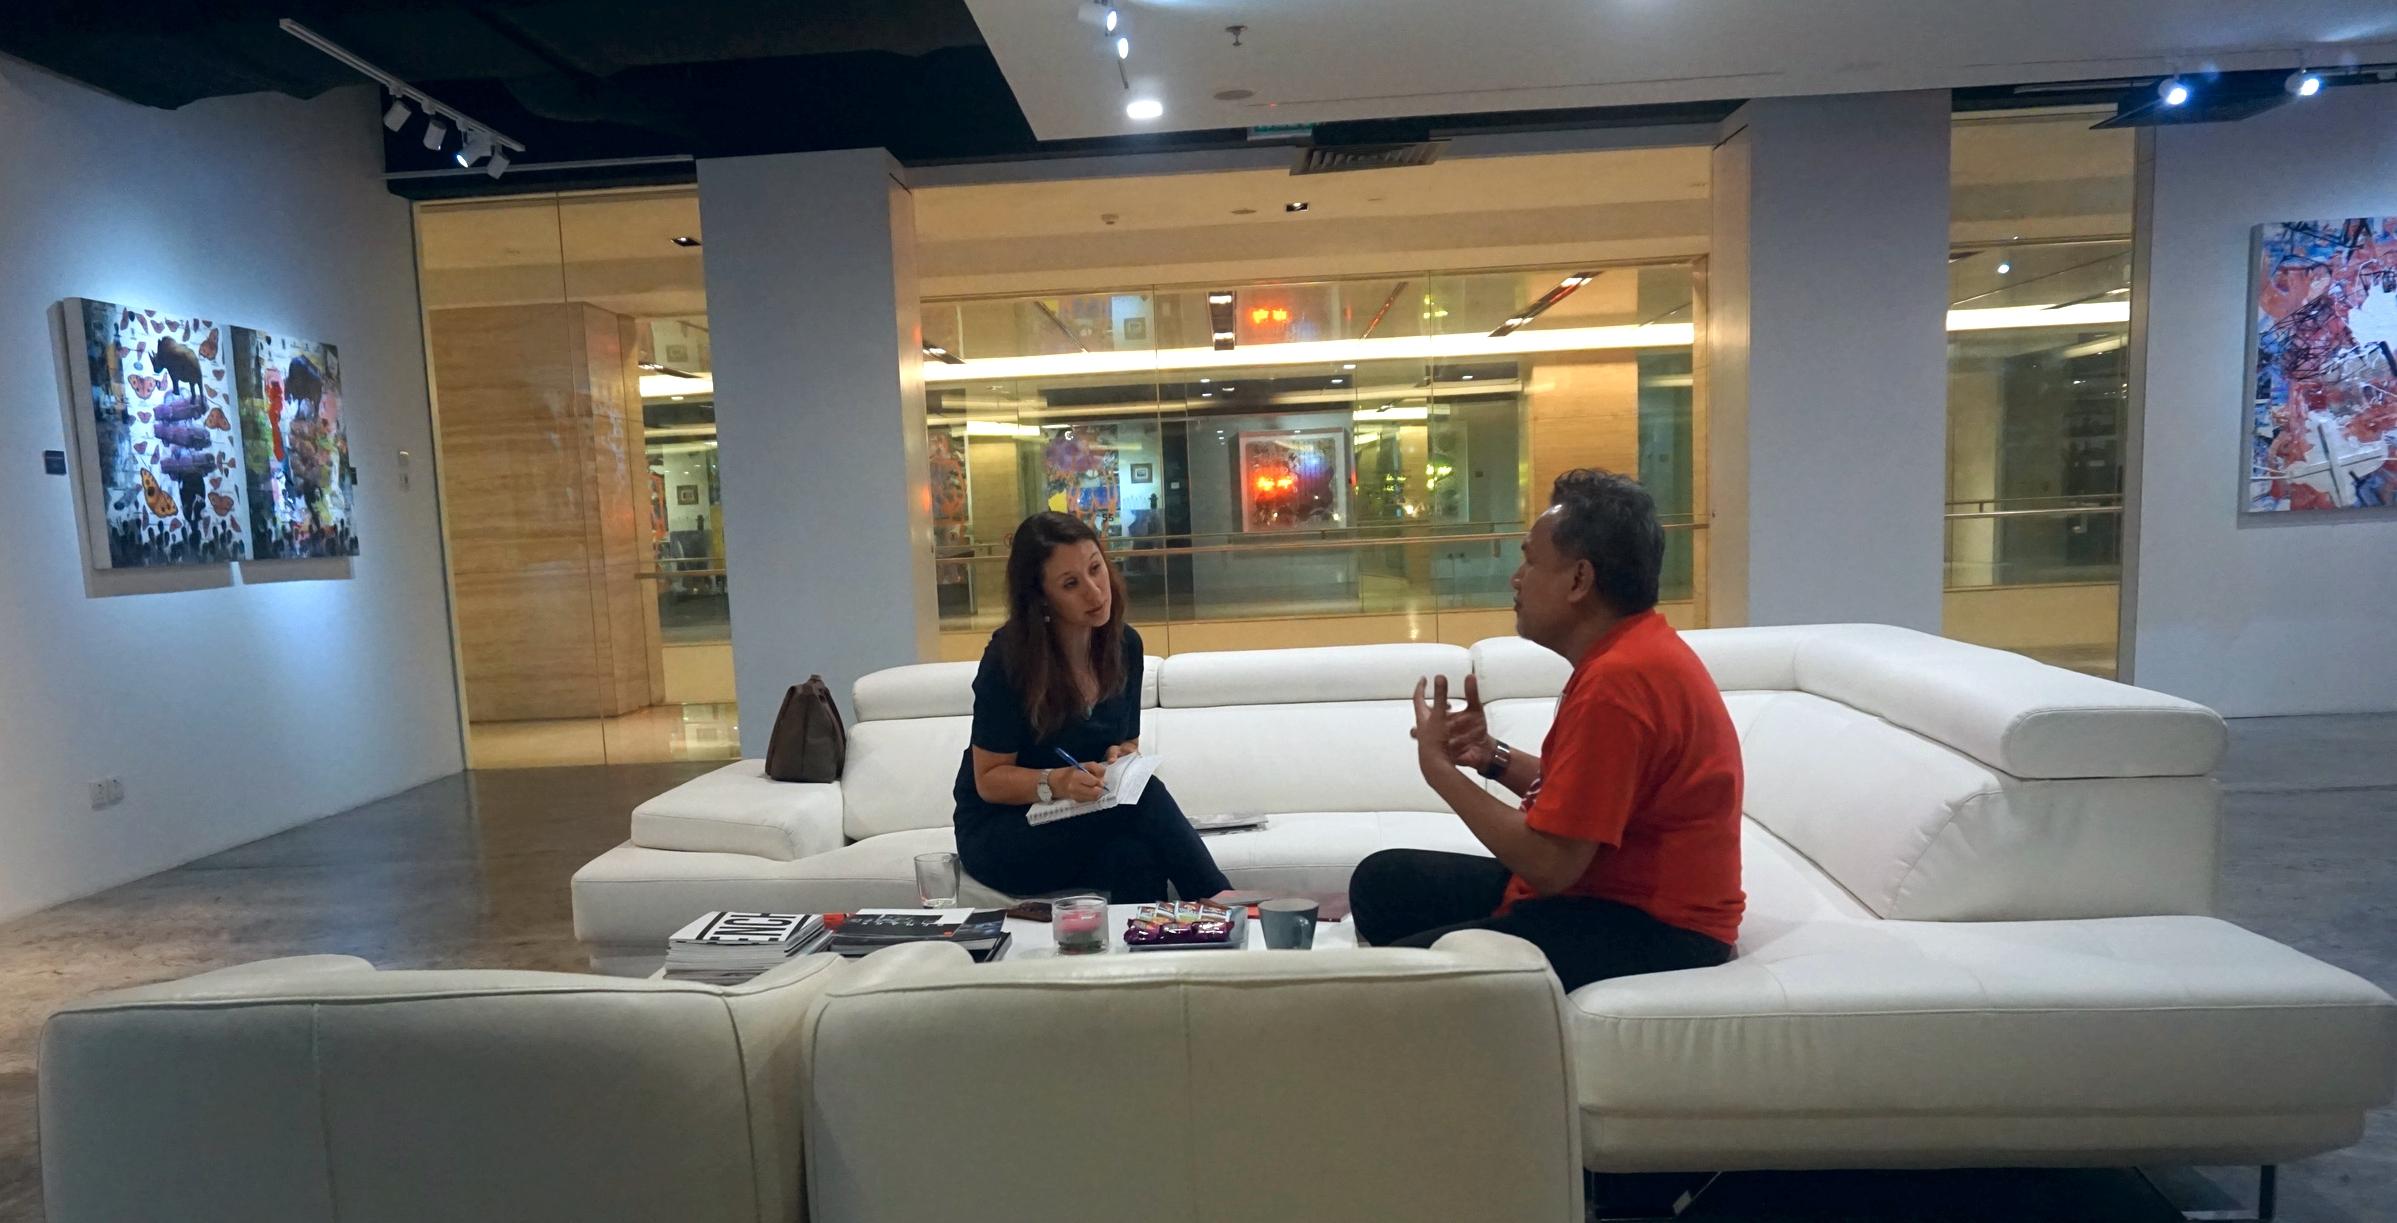 Suhimi Fadzir and Yiga in conversation at Artcube